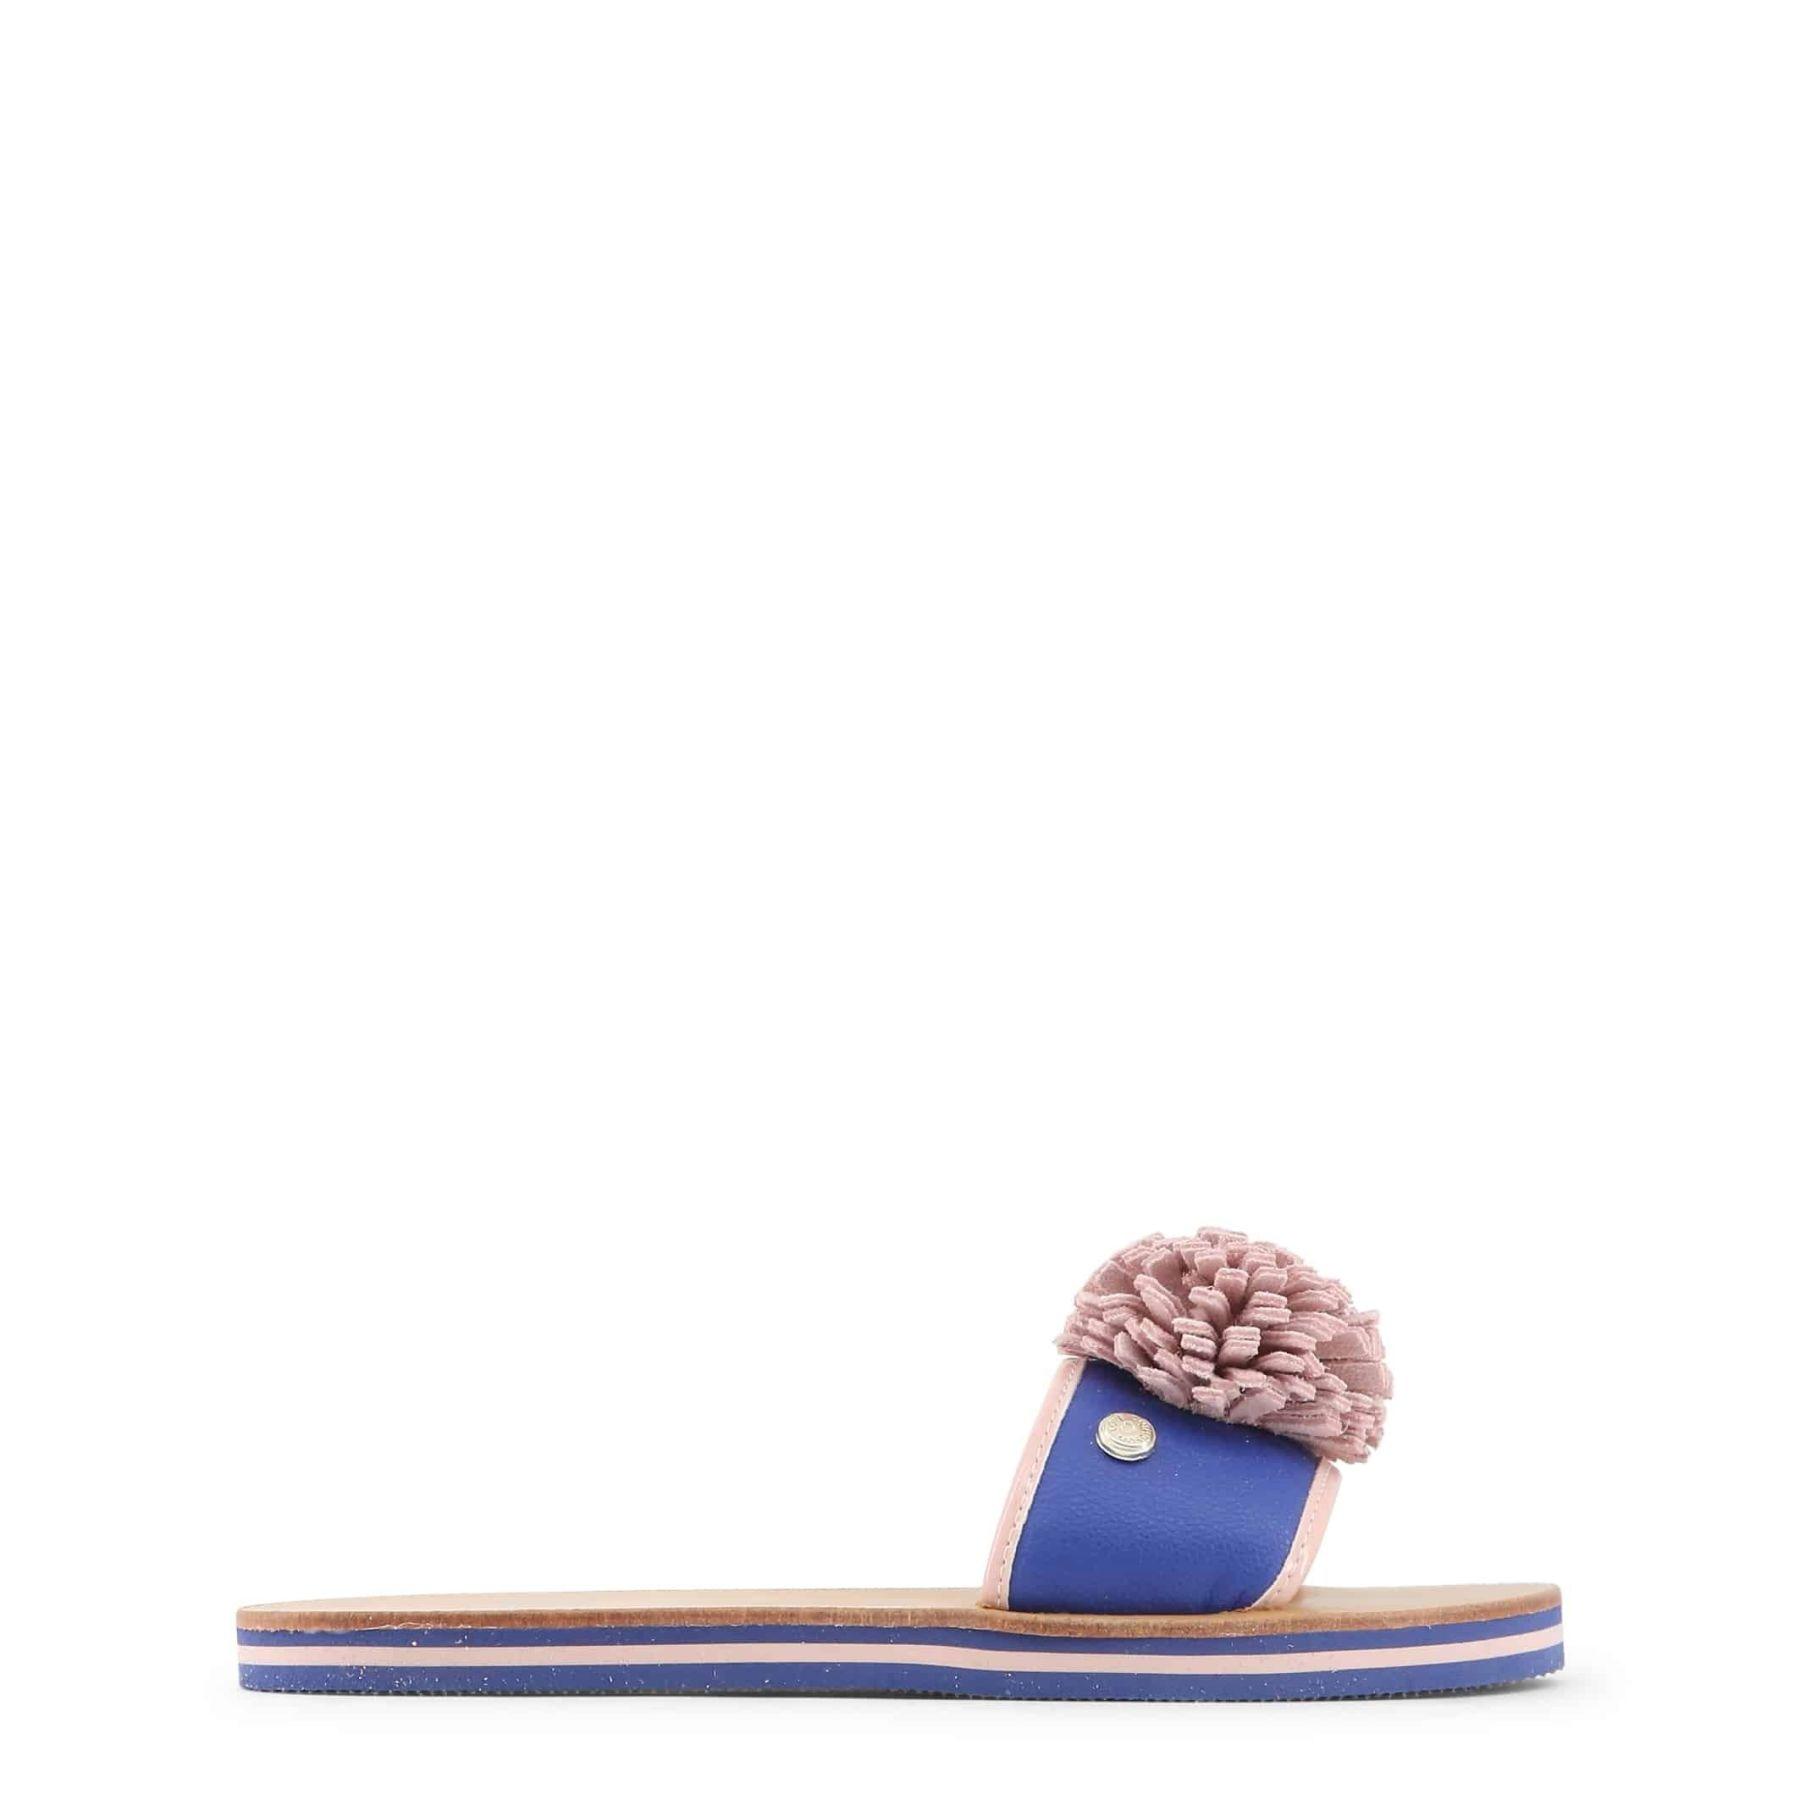 Love Moschino - JA28012G15ID - Azul Sandalias de mujer, calzado de verano, chanclas